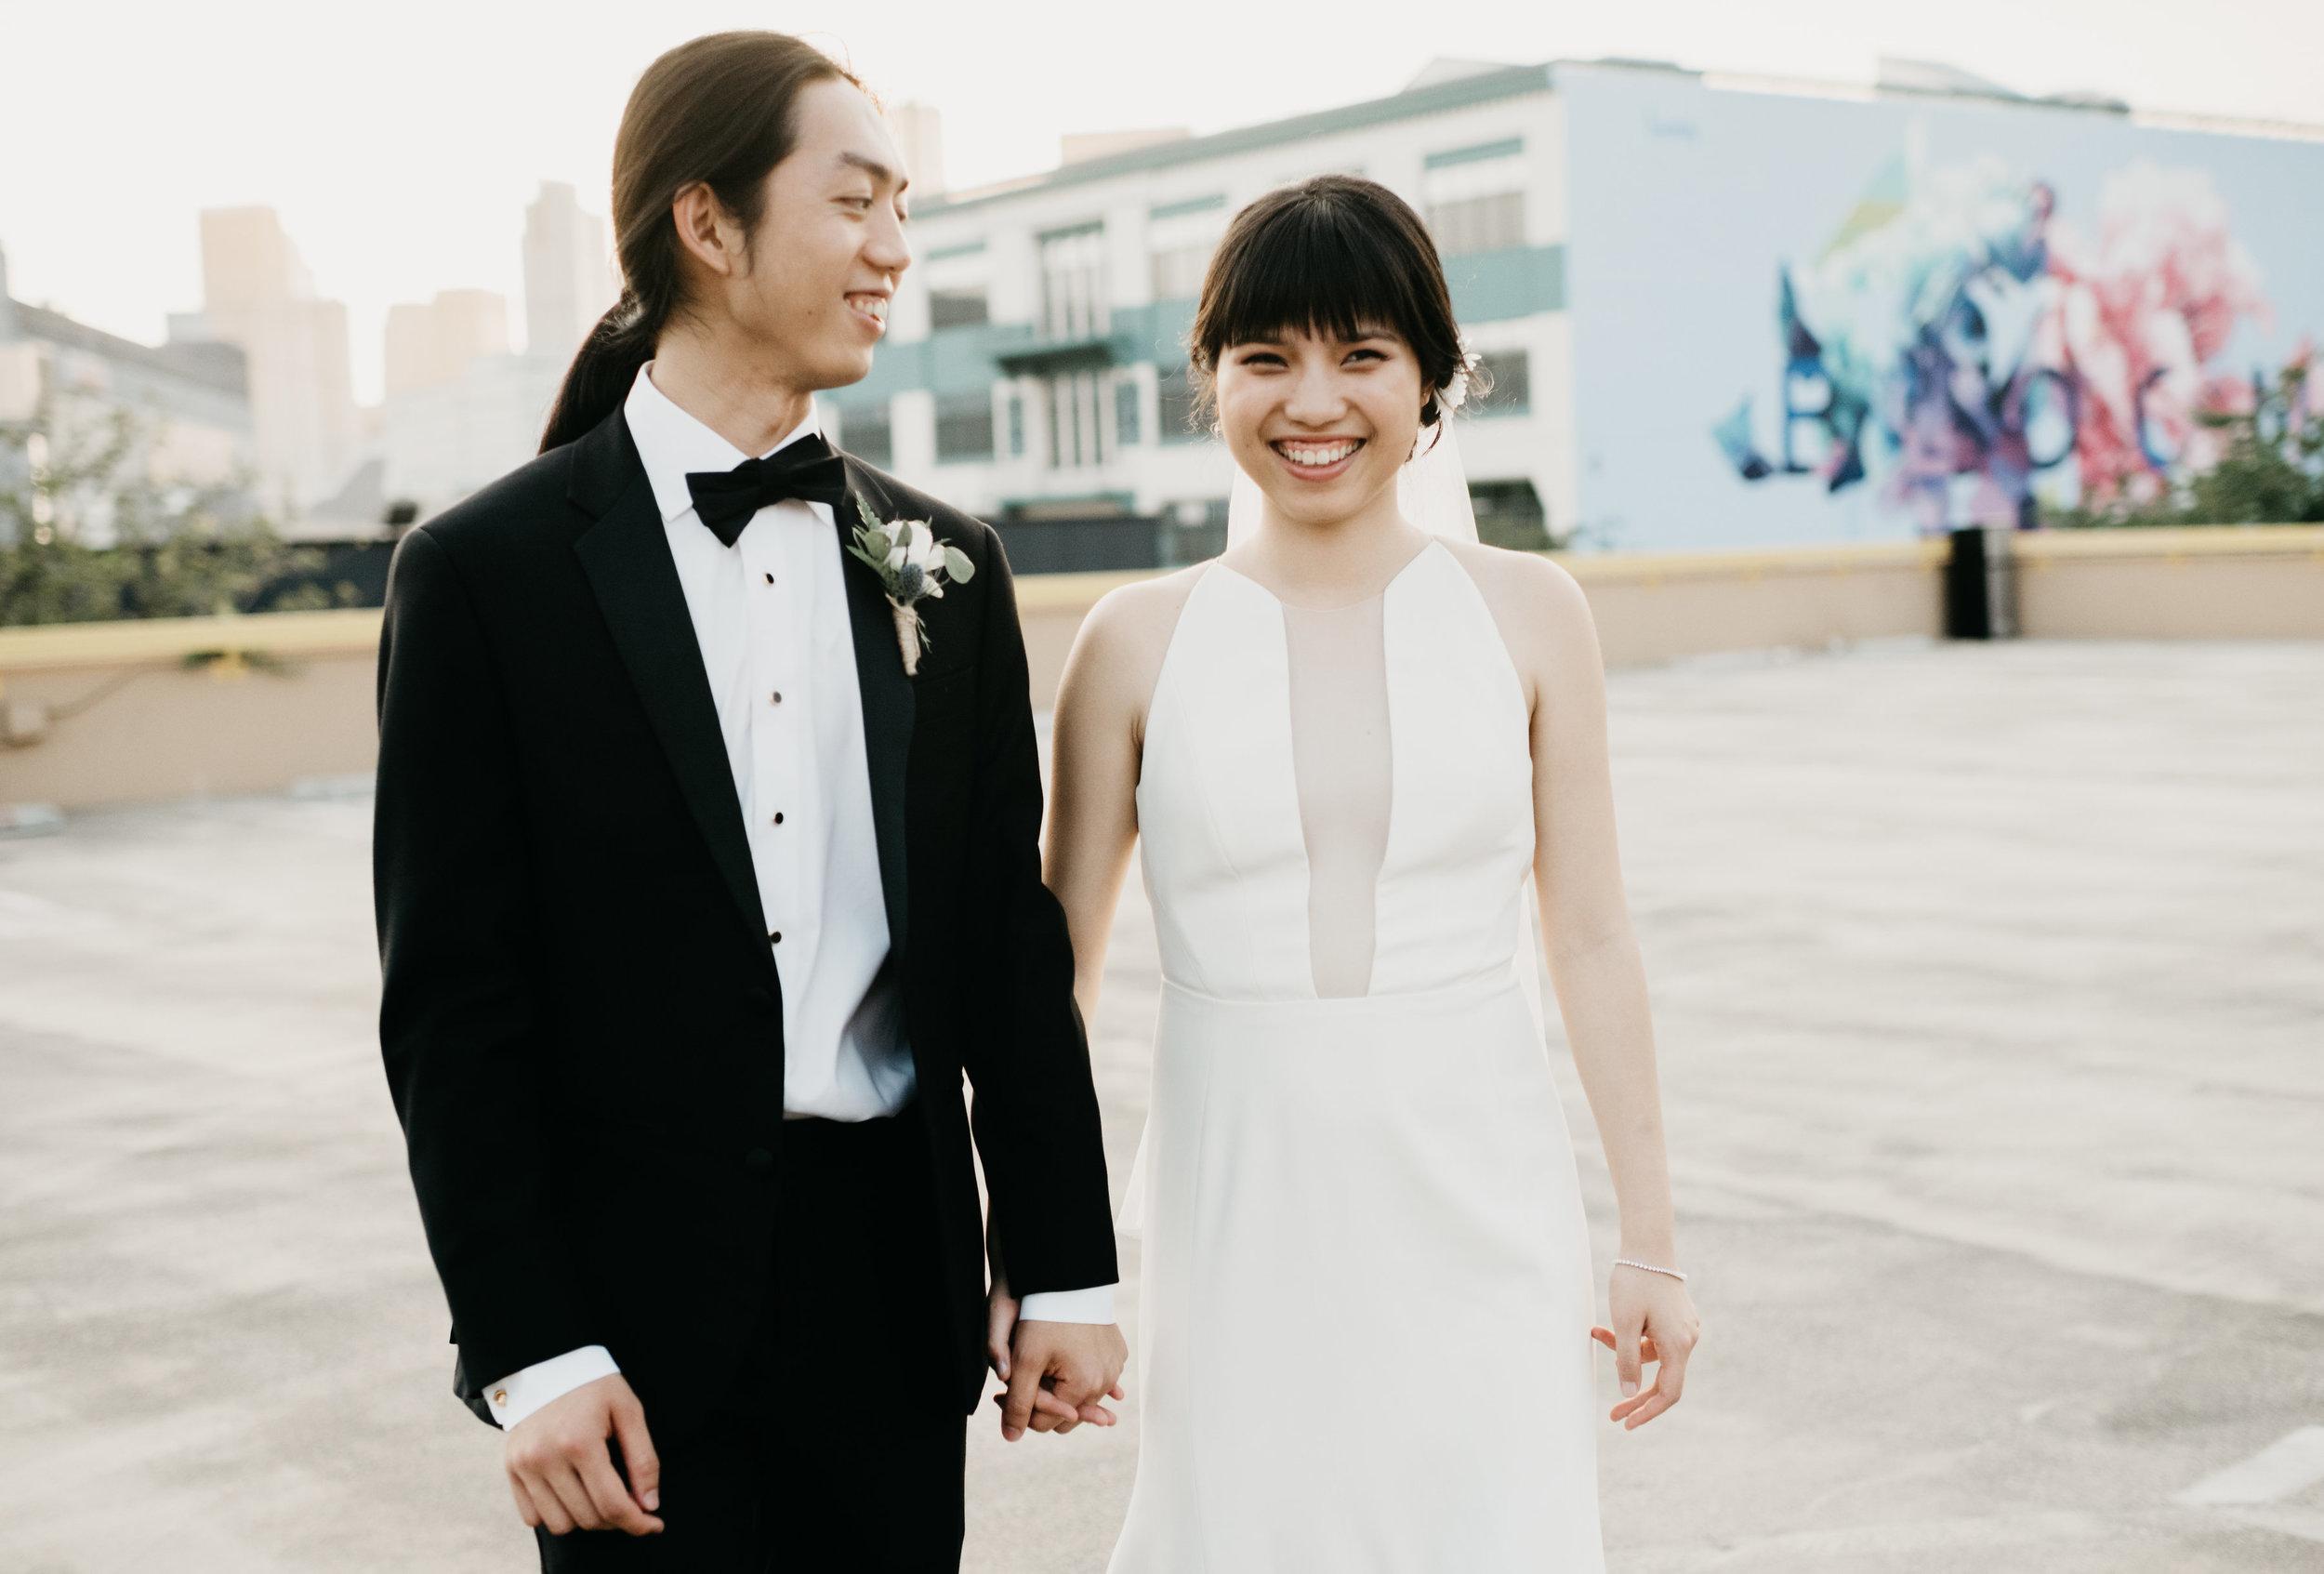 Millwick-wedding-planner91.jpg